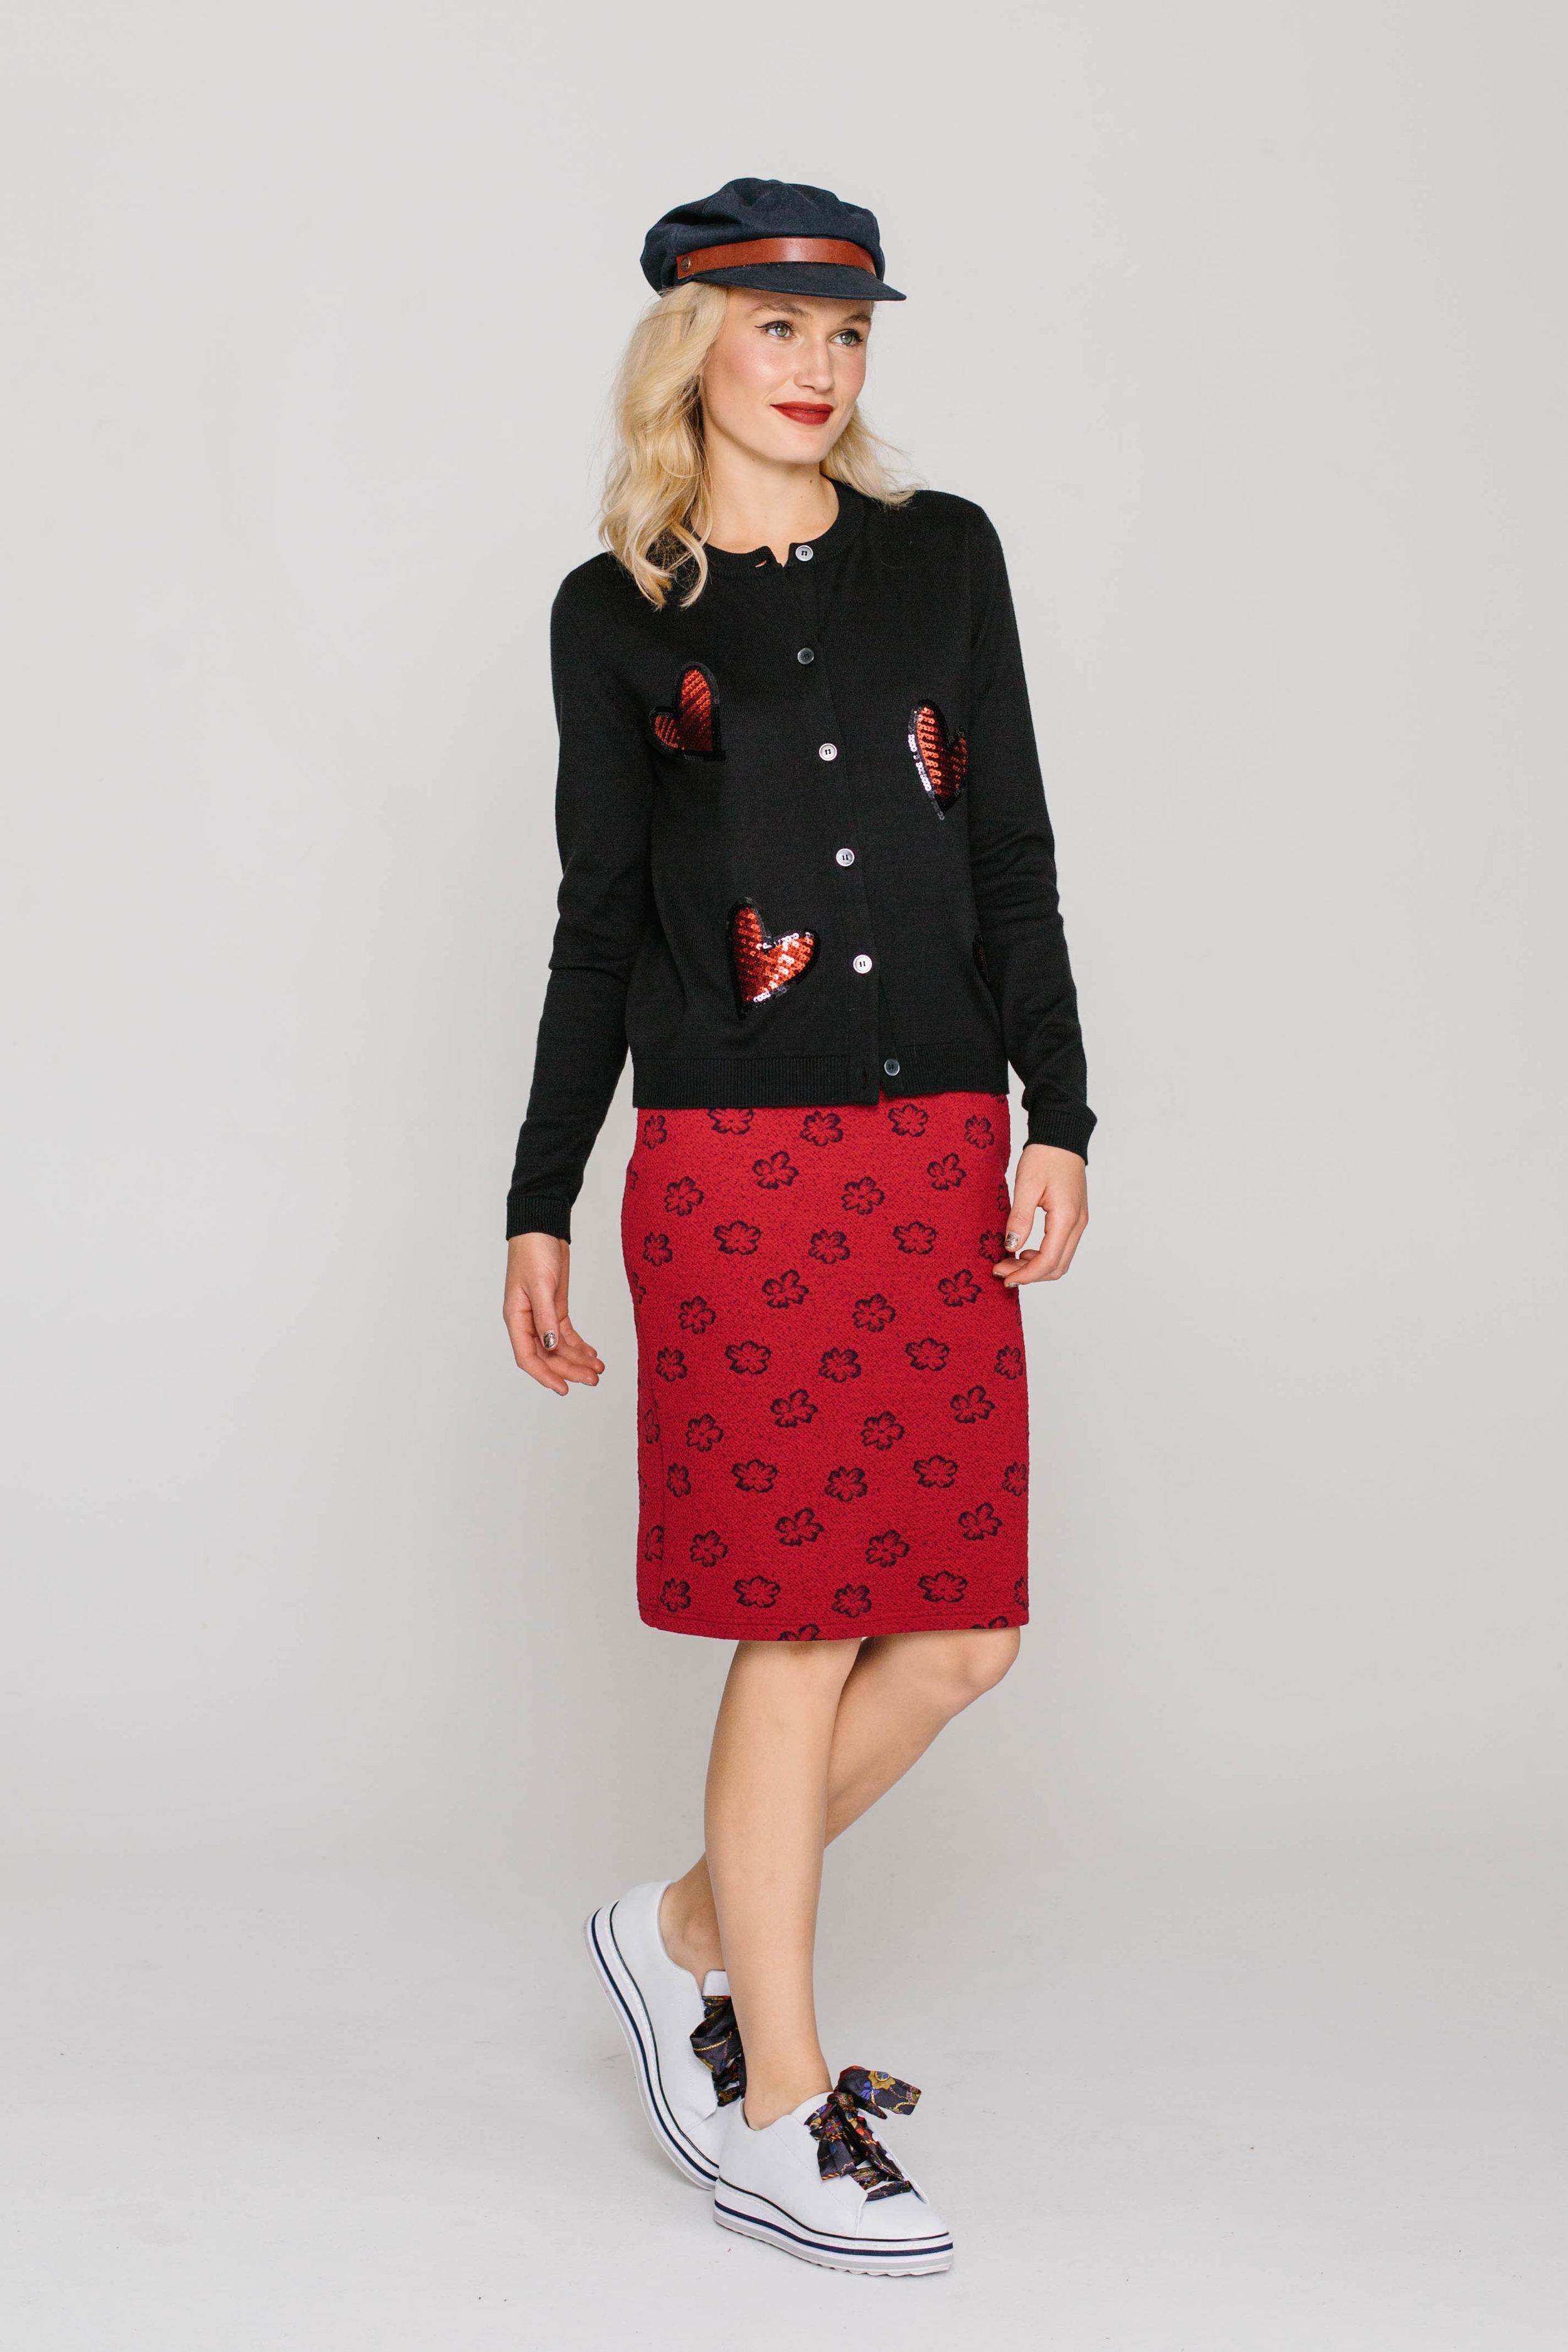 6198W Jewelled Cardi Love Hearts 4661W Skinny Skirt Red Sponge